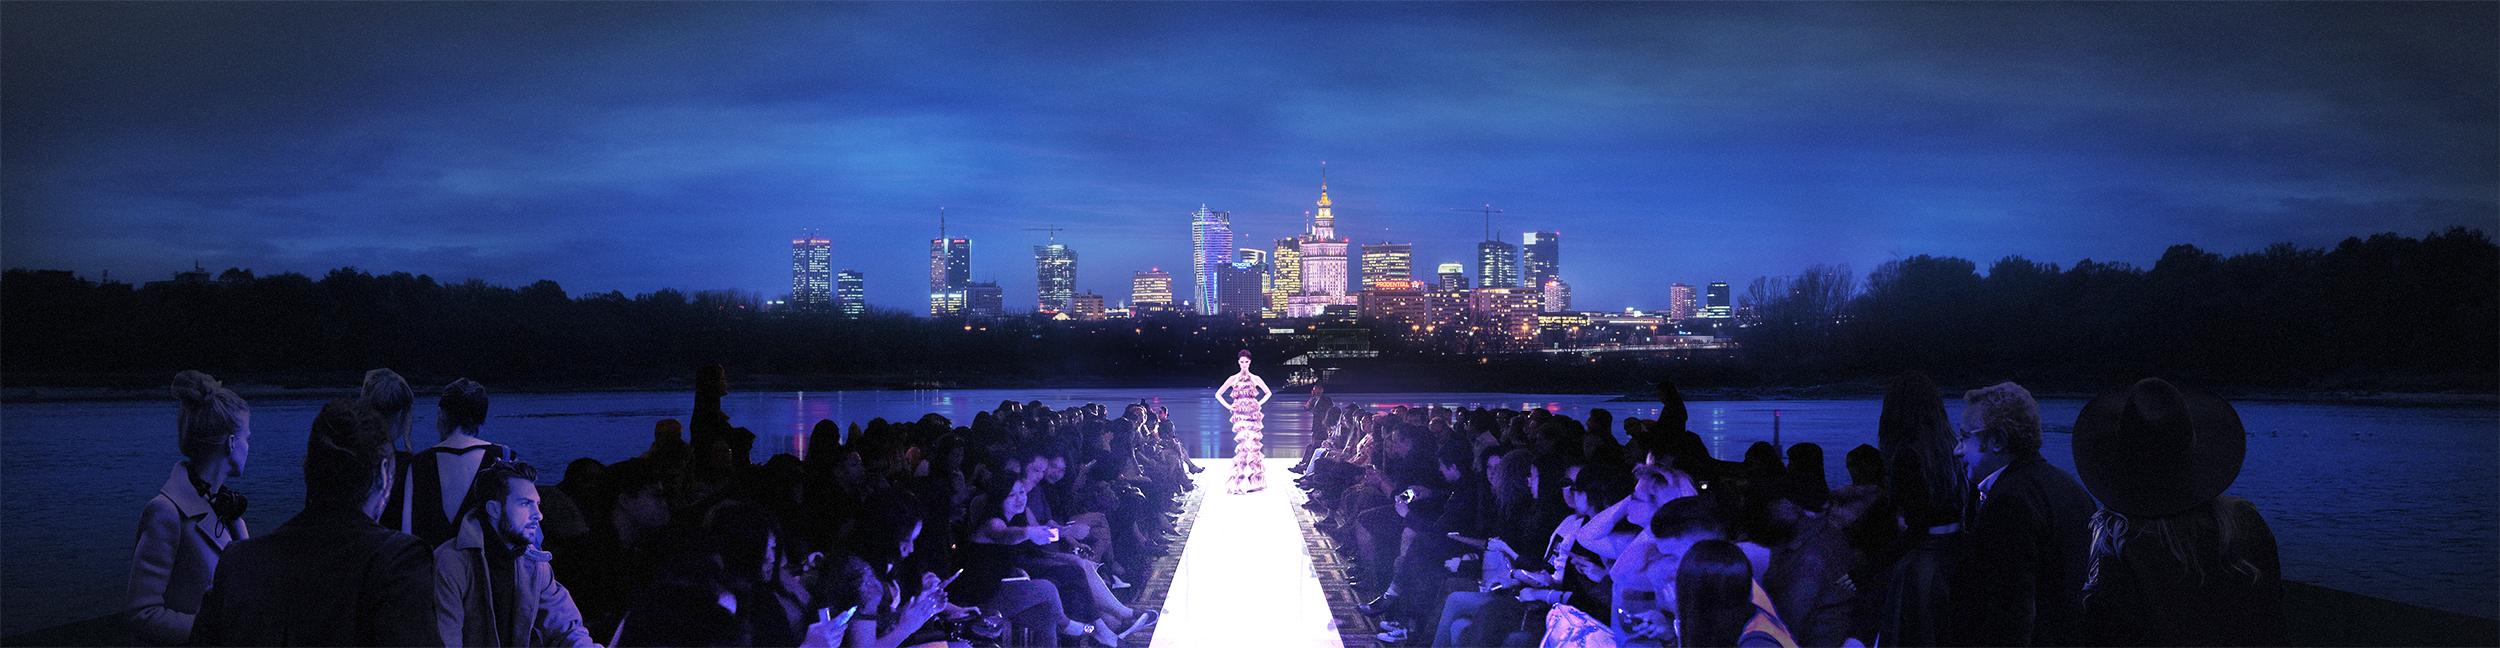 MJZ-River-Fashion-Show_BOAT-SHOW